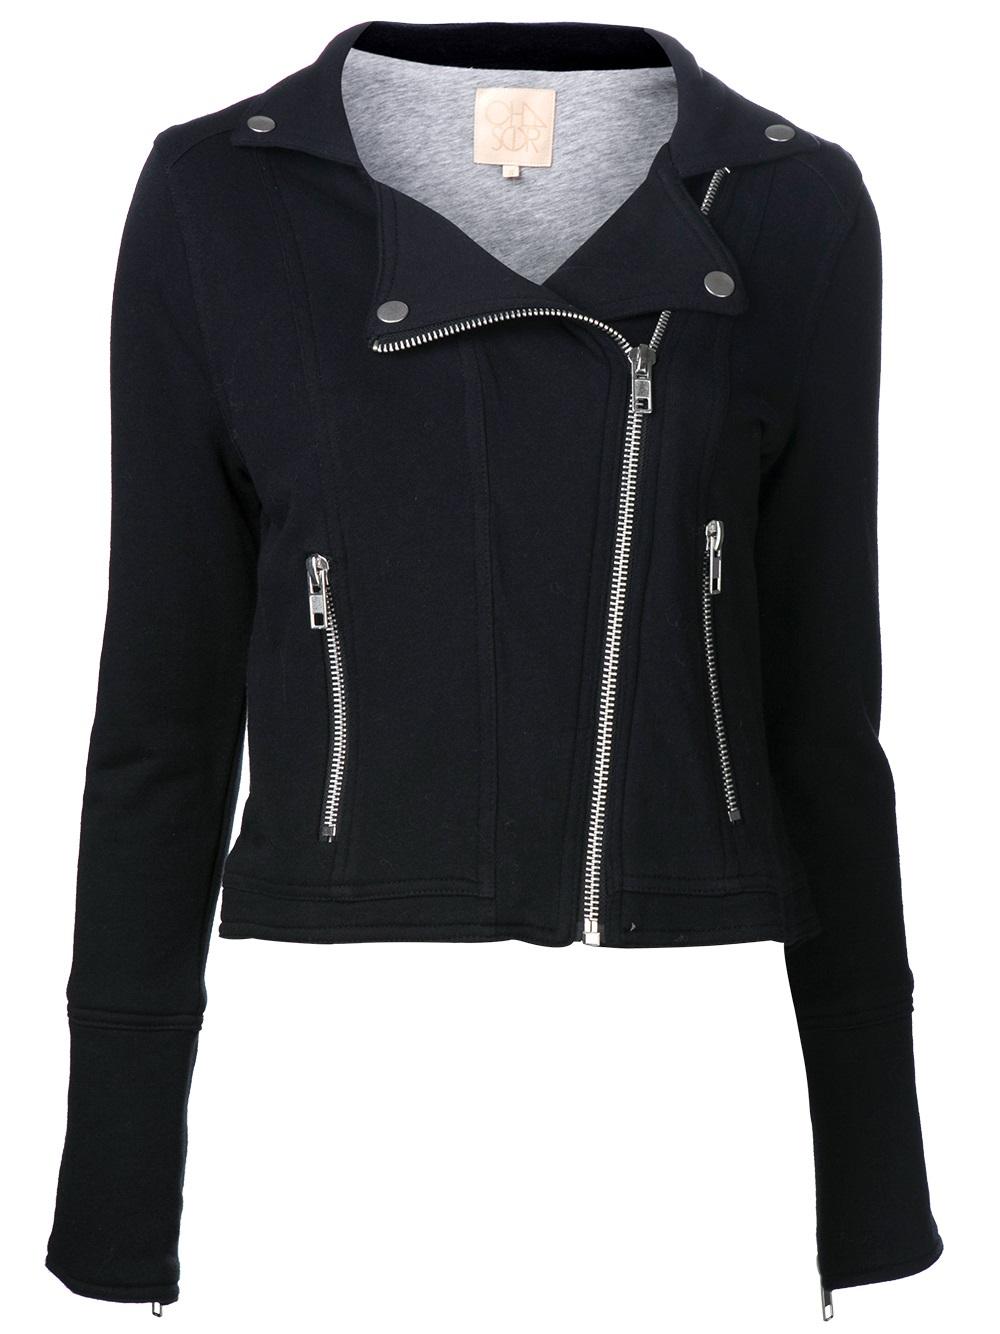 Lyst - Chaser Moto Jacket in Black